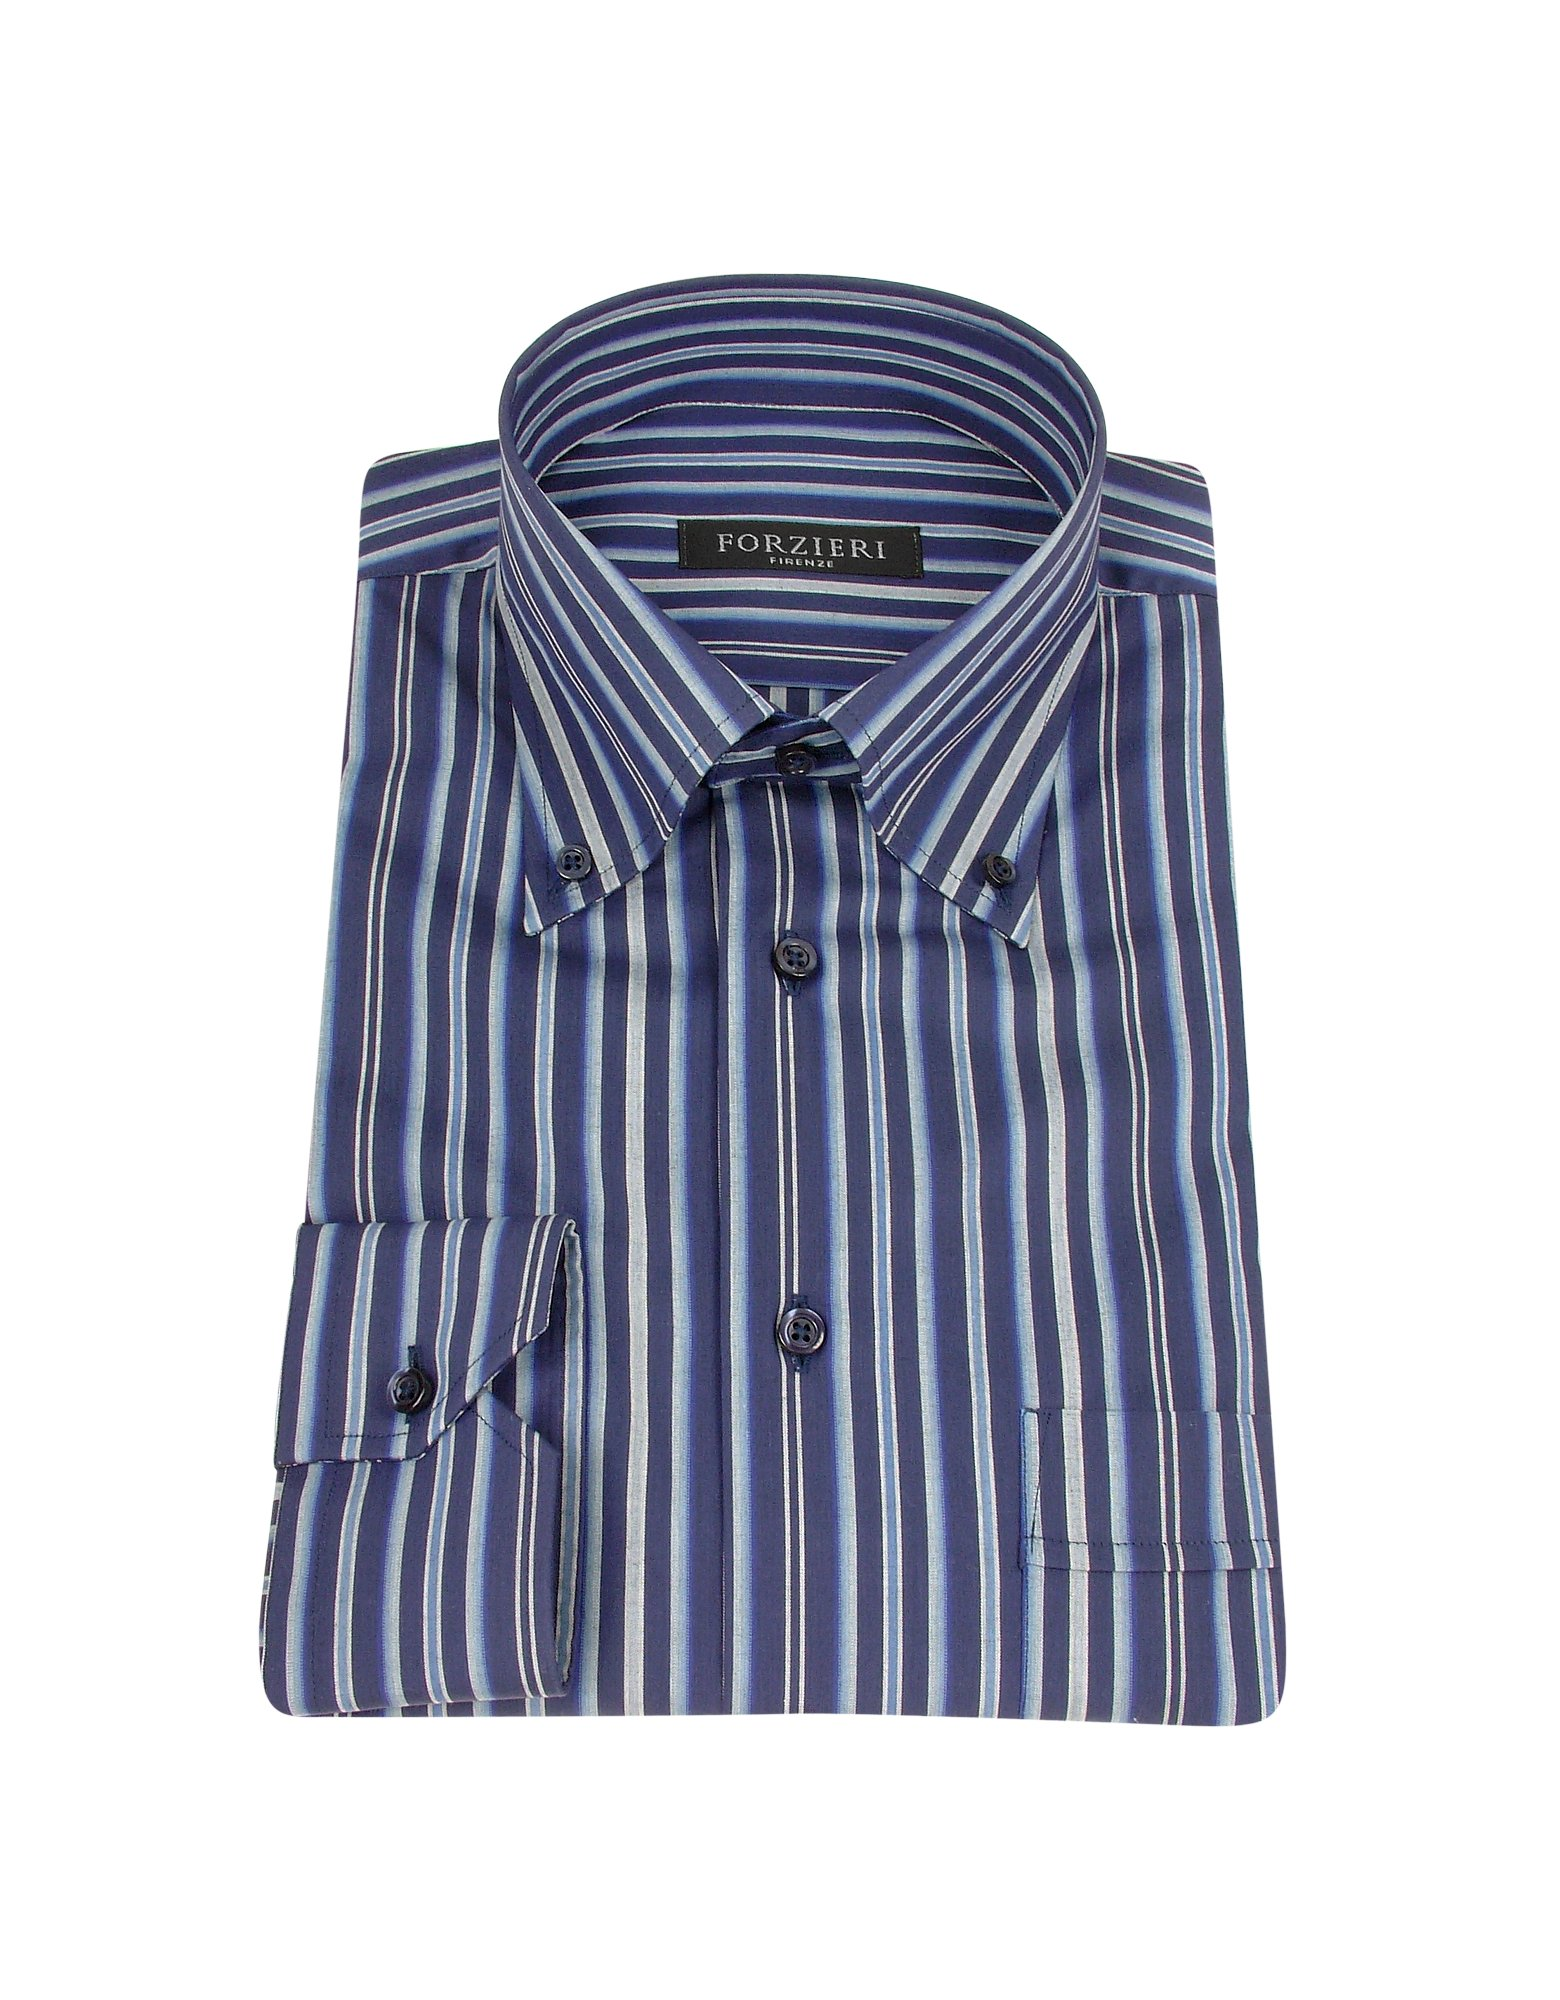 Lyst Forzieri Blue Variegated Striped Cotton Dress Shirt